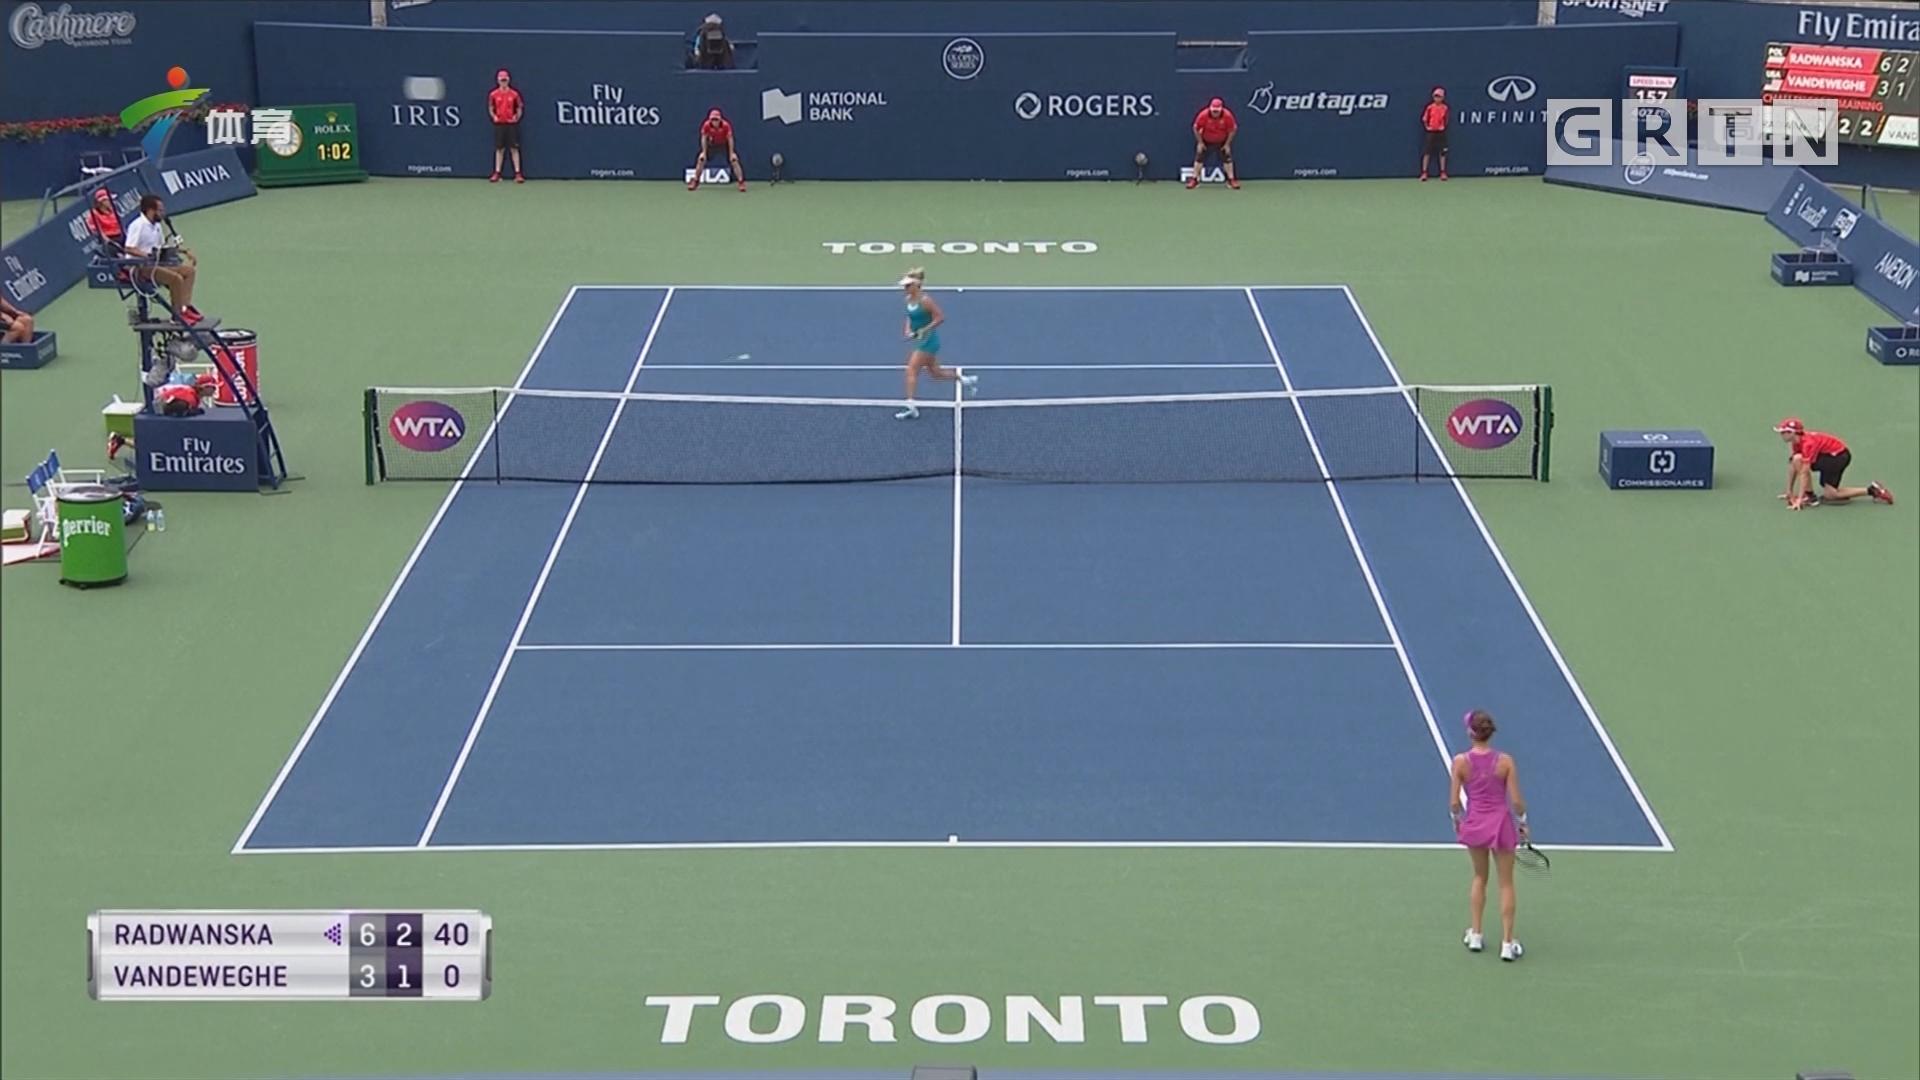 WTA罗杰斯杯 拉德万斯卡晋级 彭帅无缘次轮